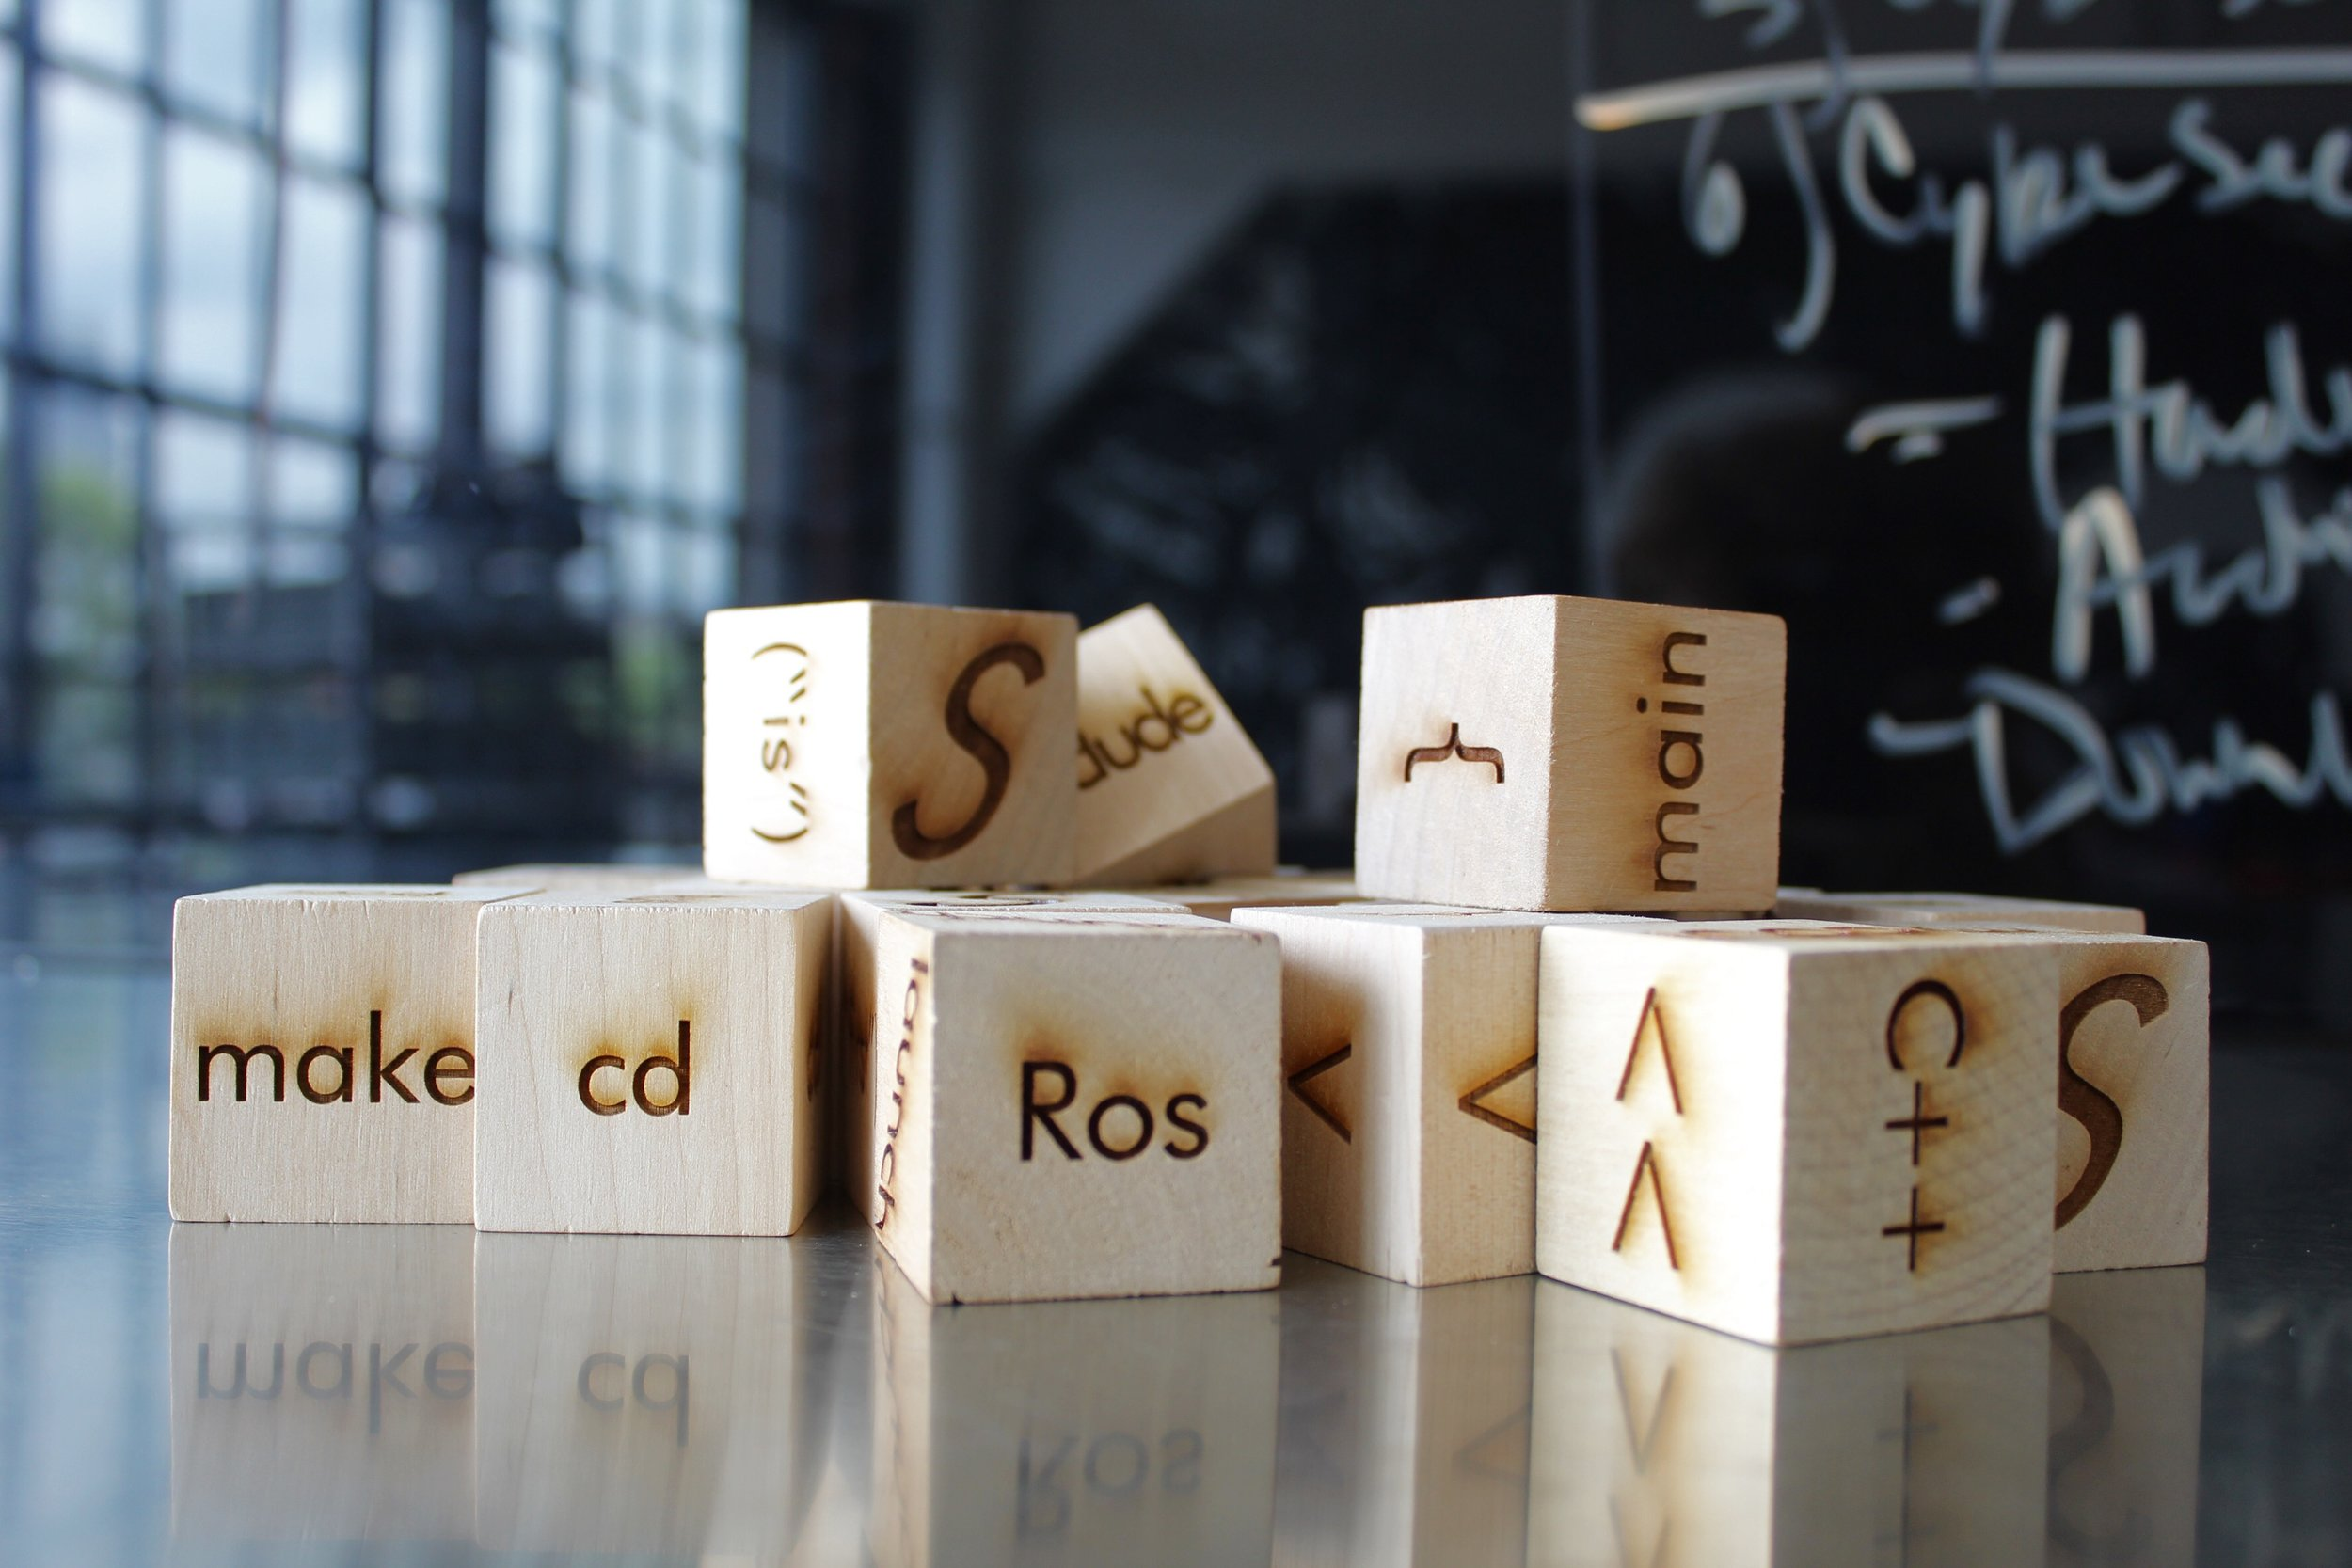 My First Blocks of Code - Early Childhood Development